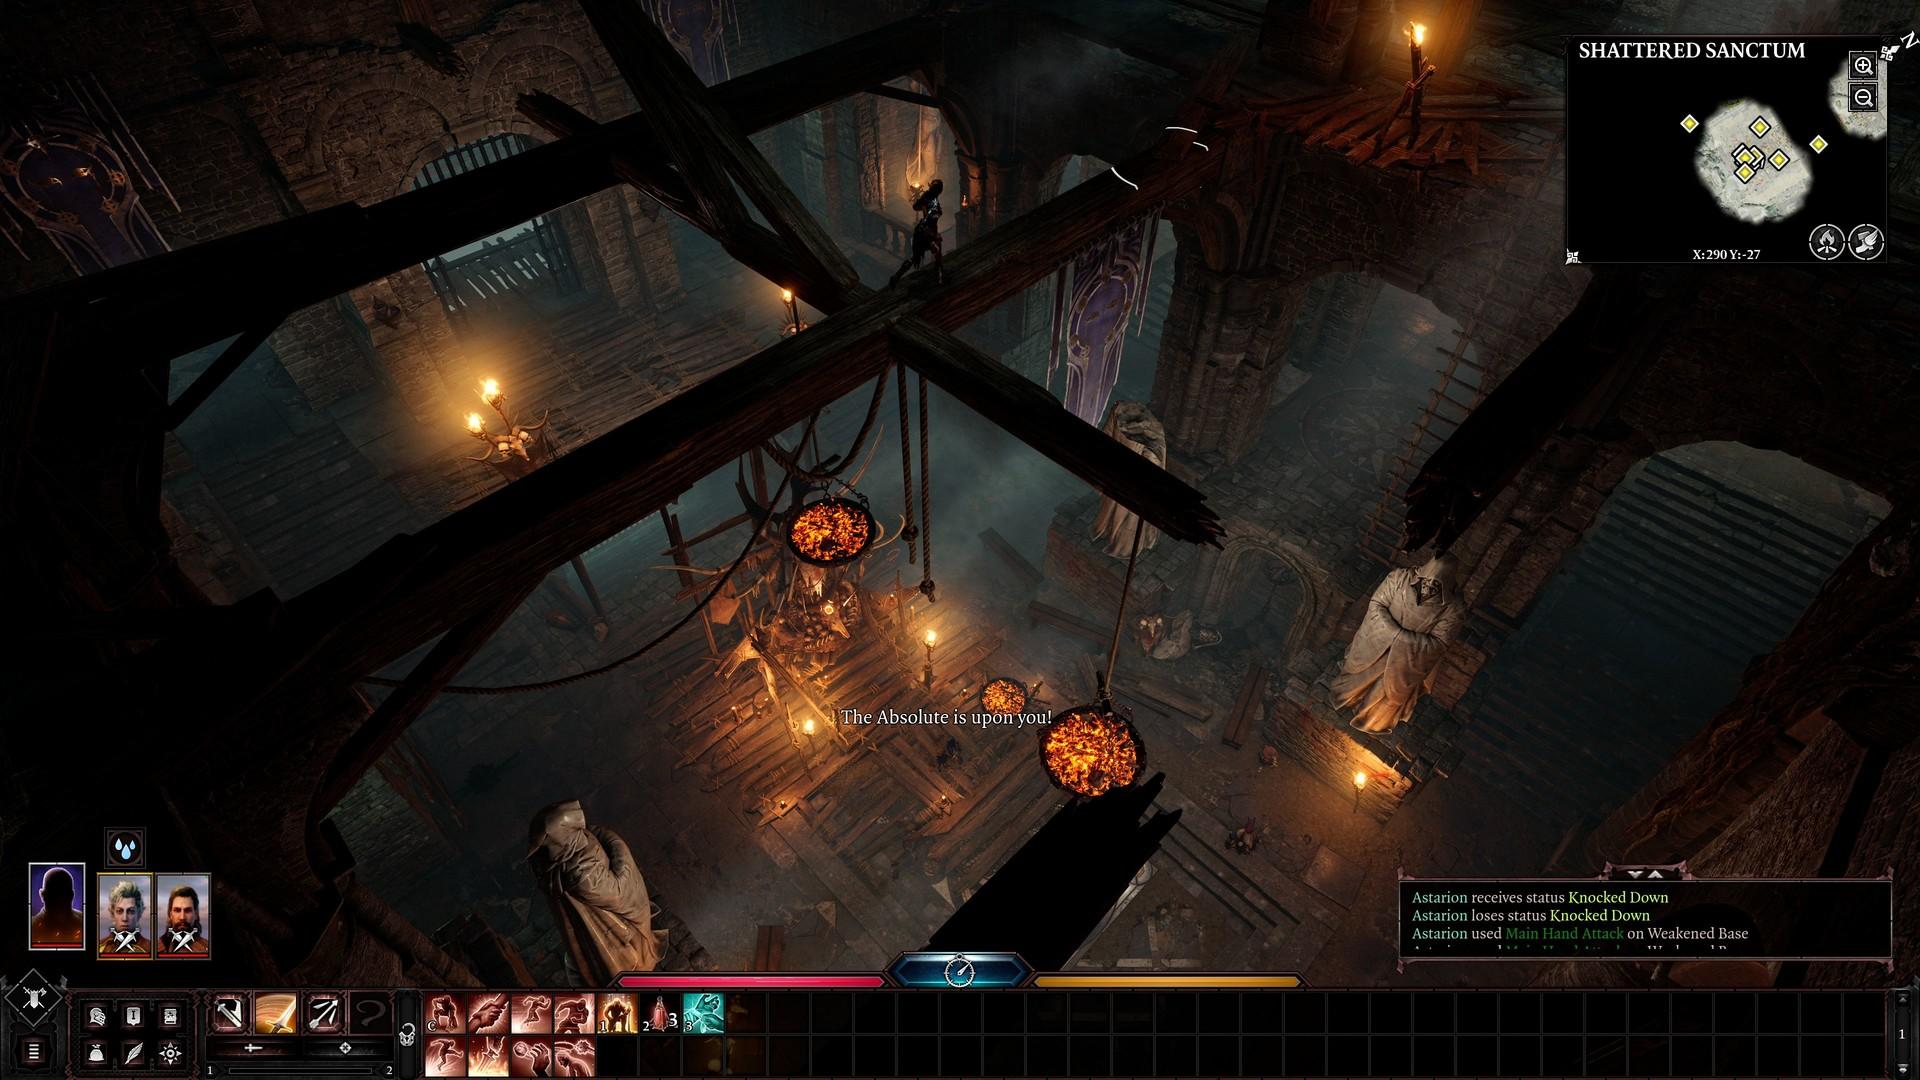 Baldur S Gate 3 Community Update Reveals Overhauled Combat System Shacknews